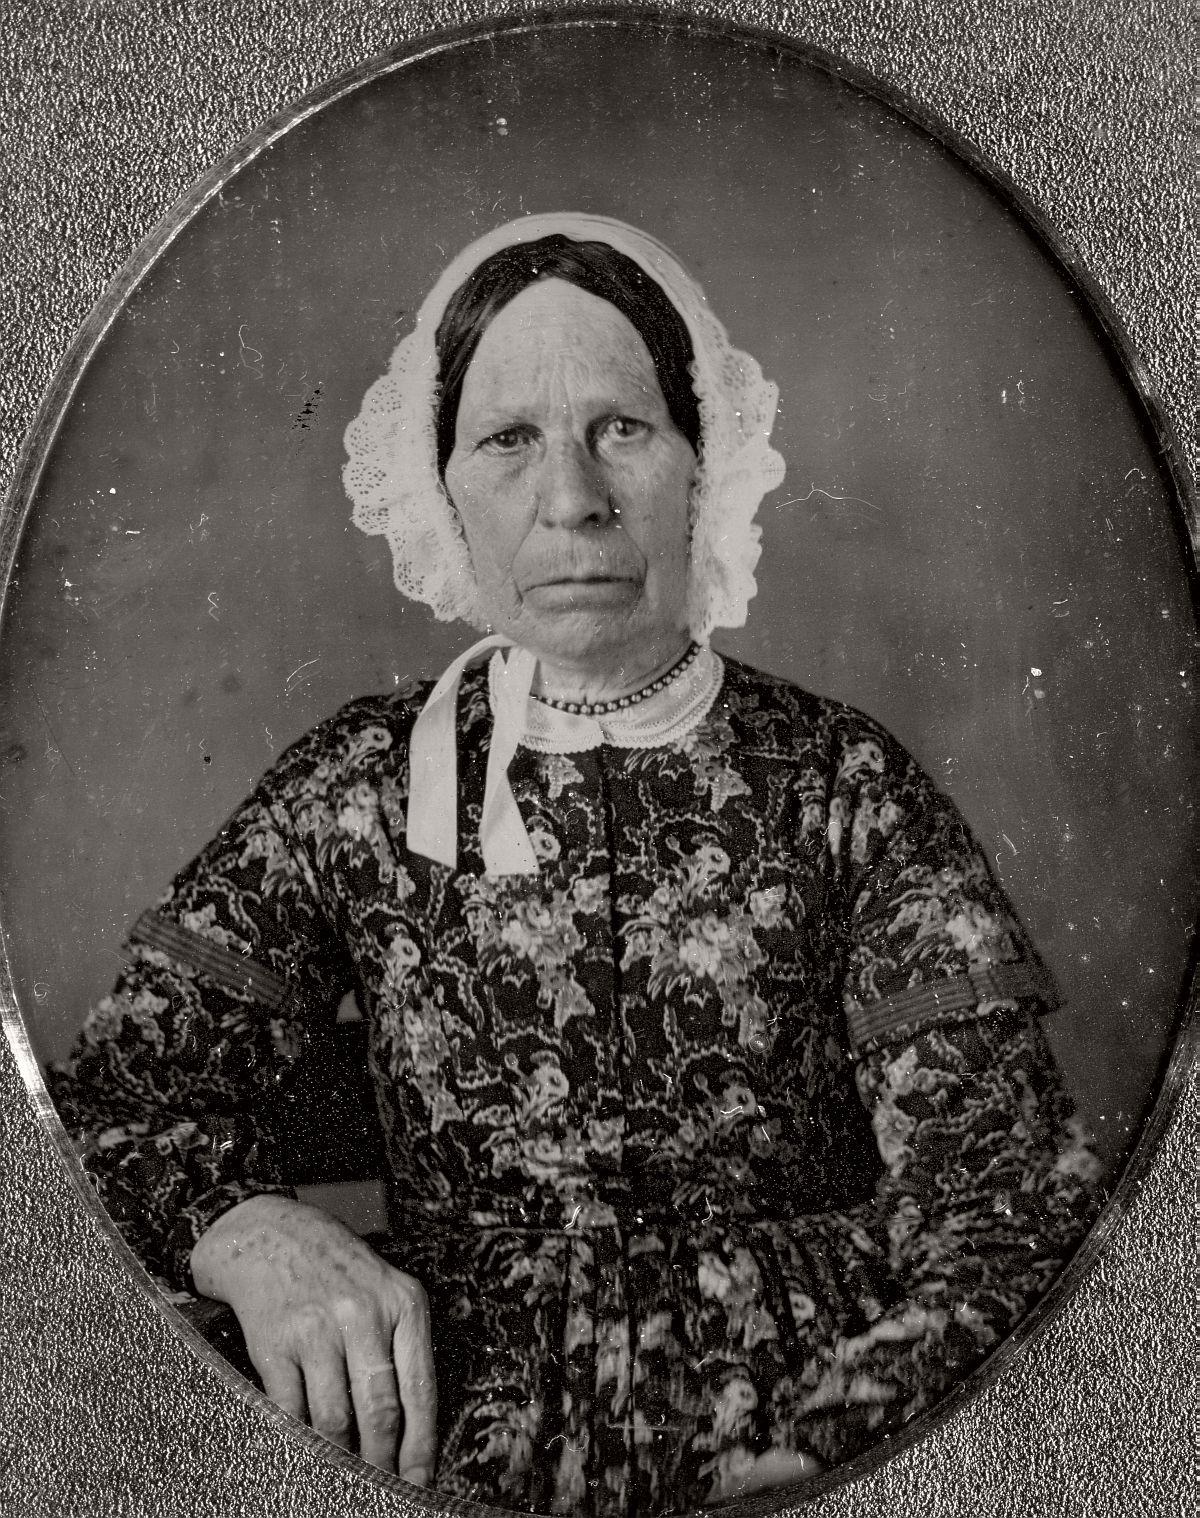 daguerreotype-portrait-ladies-born-in-the-late-18th-century-1700s-vintage-03